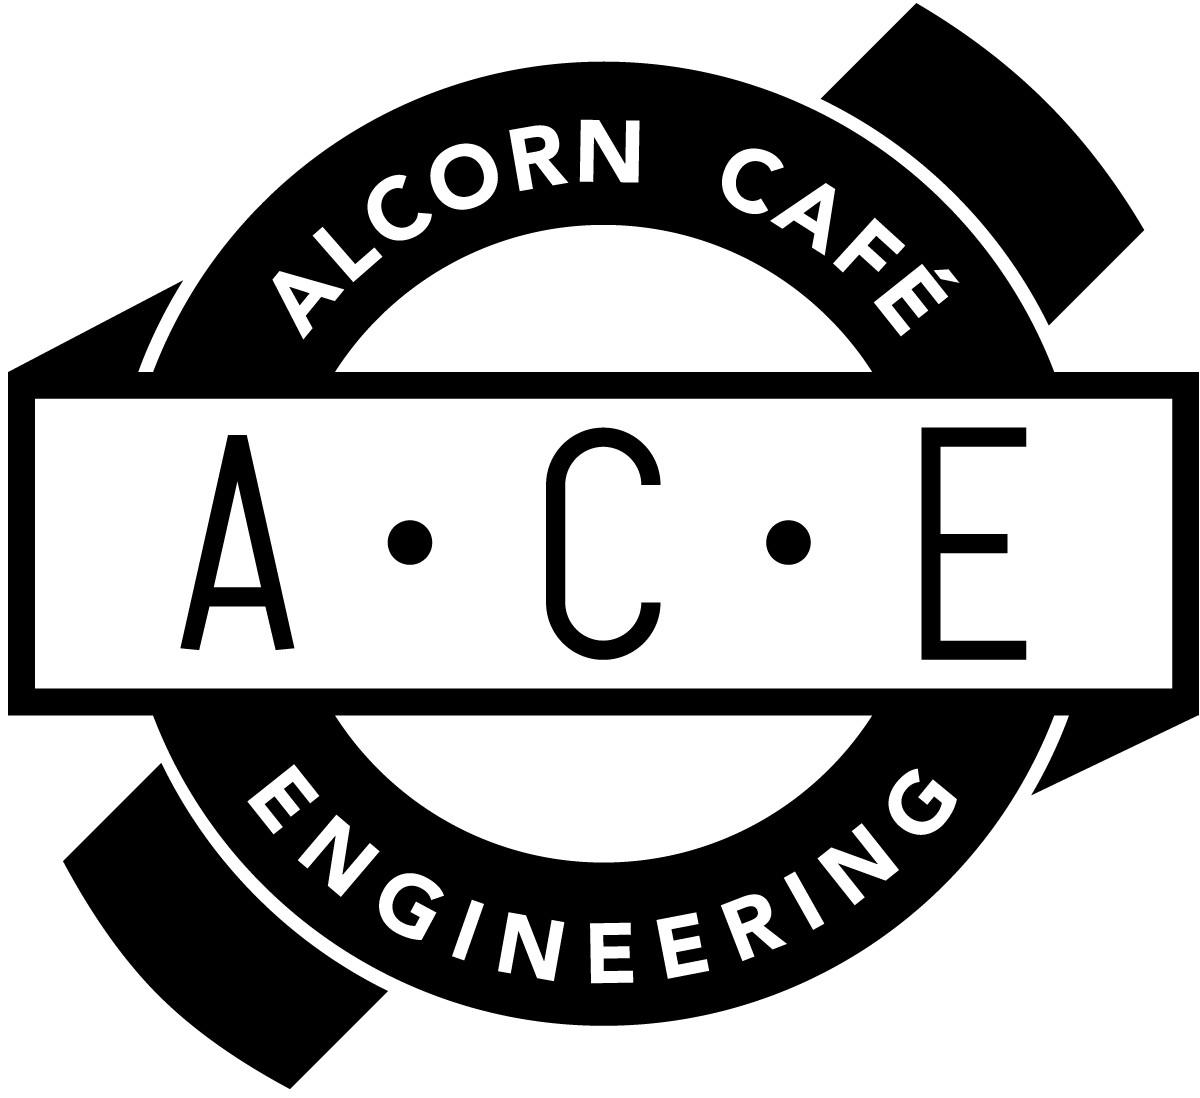 Alcorn Cafe Engineering Pty Ltd